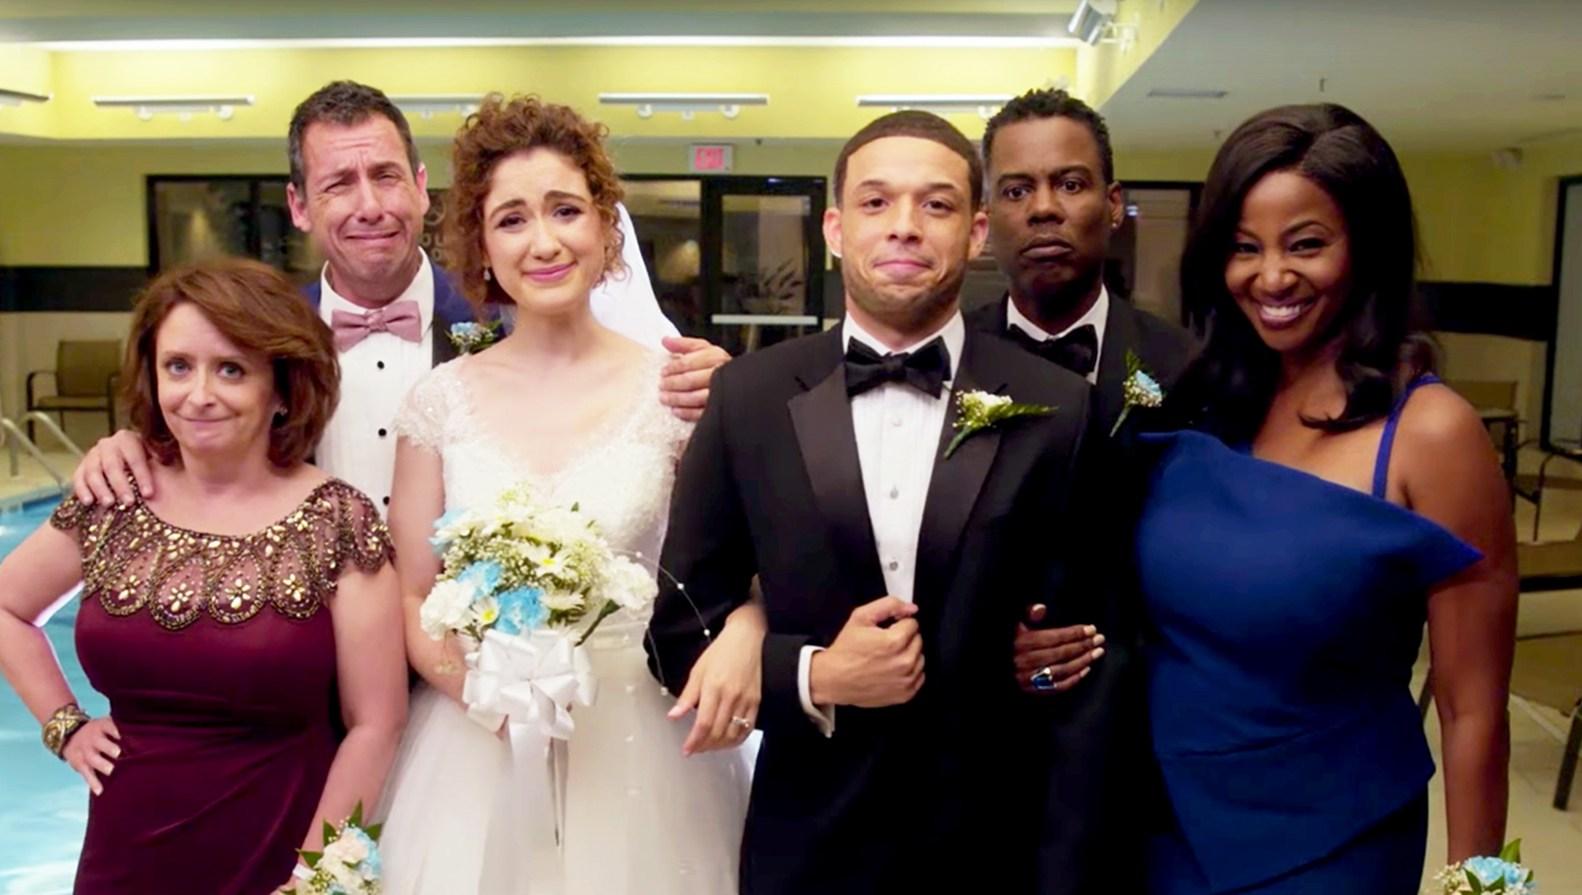 Adam Sandler and Chris Rock's Netflix Film 'The Week Of'